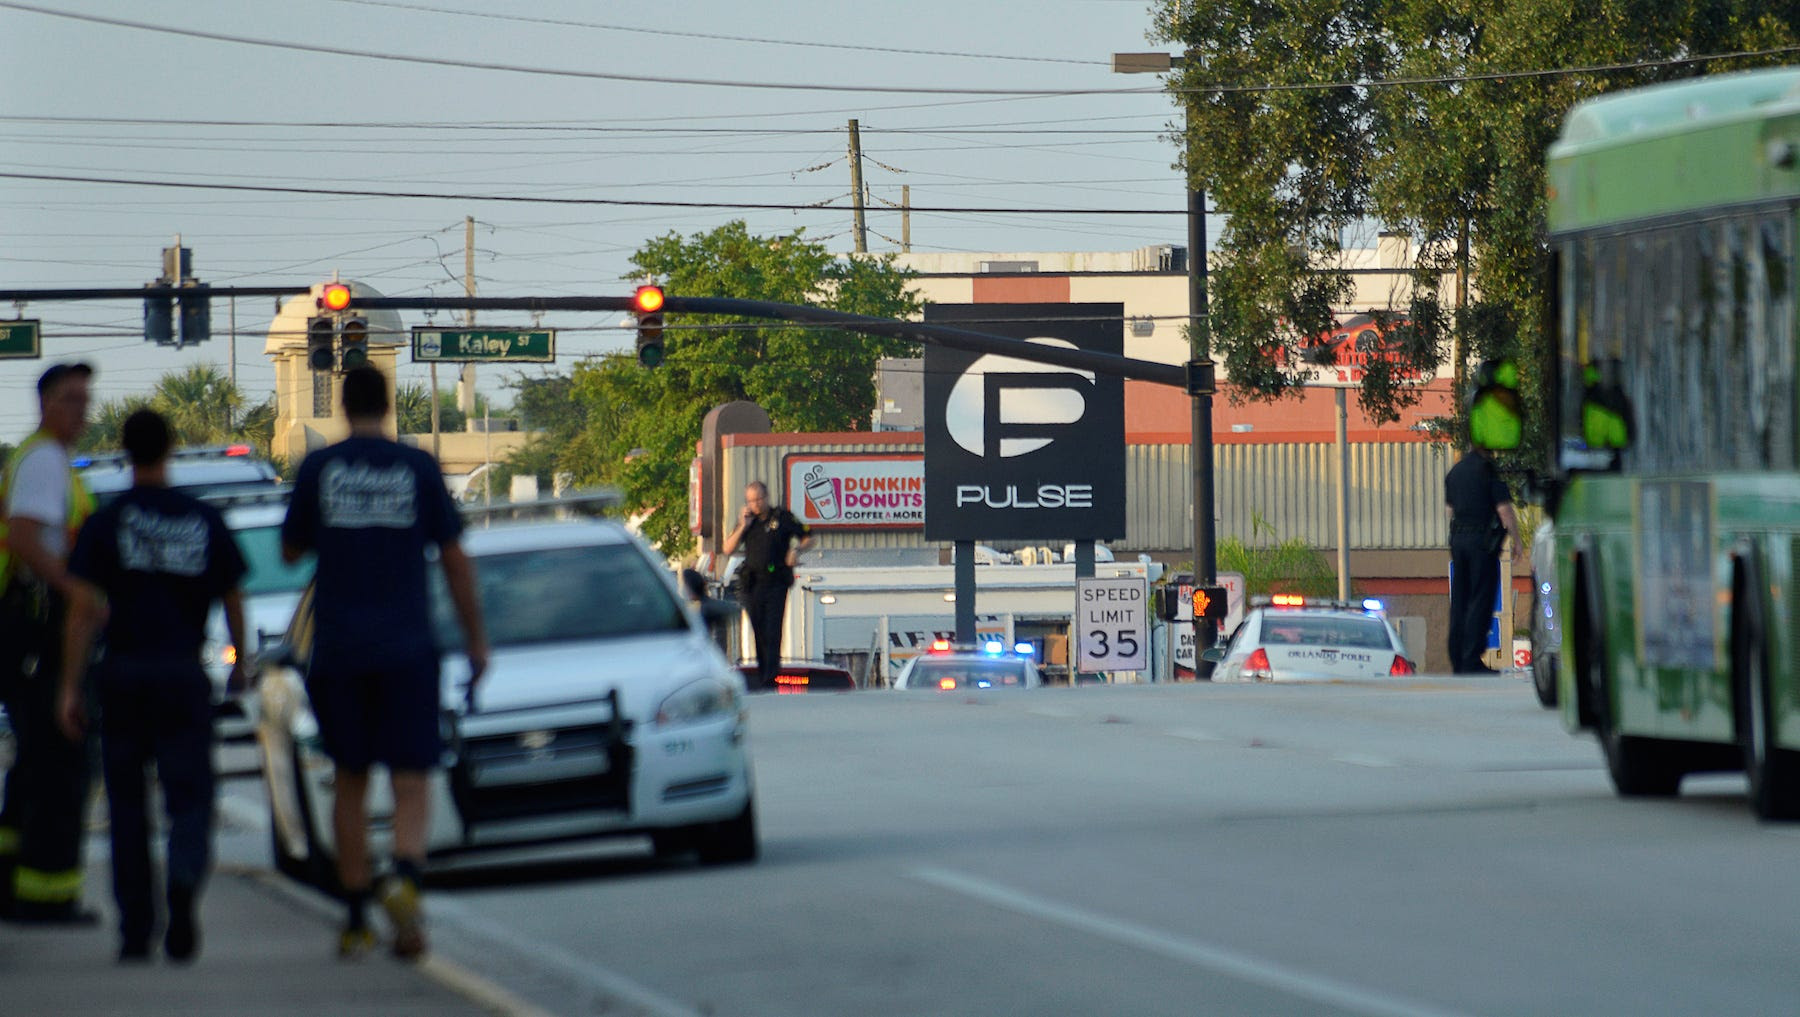 Pulse Nighclub Orlando Shooting